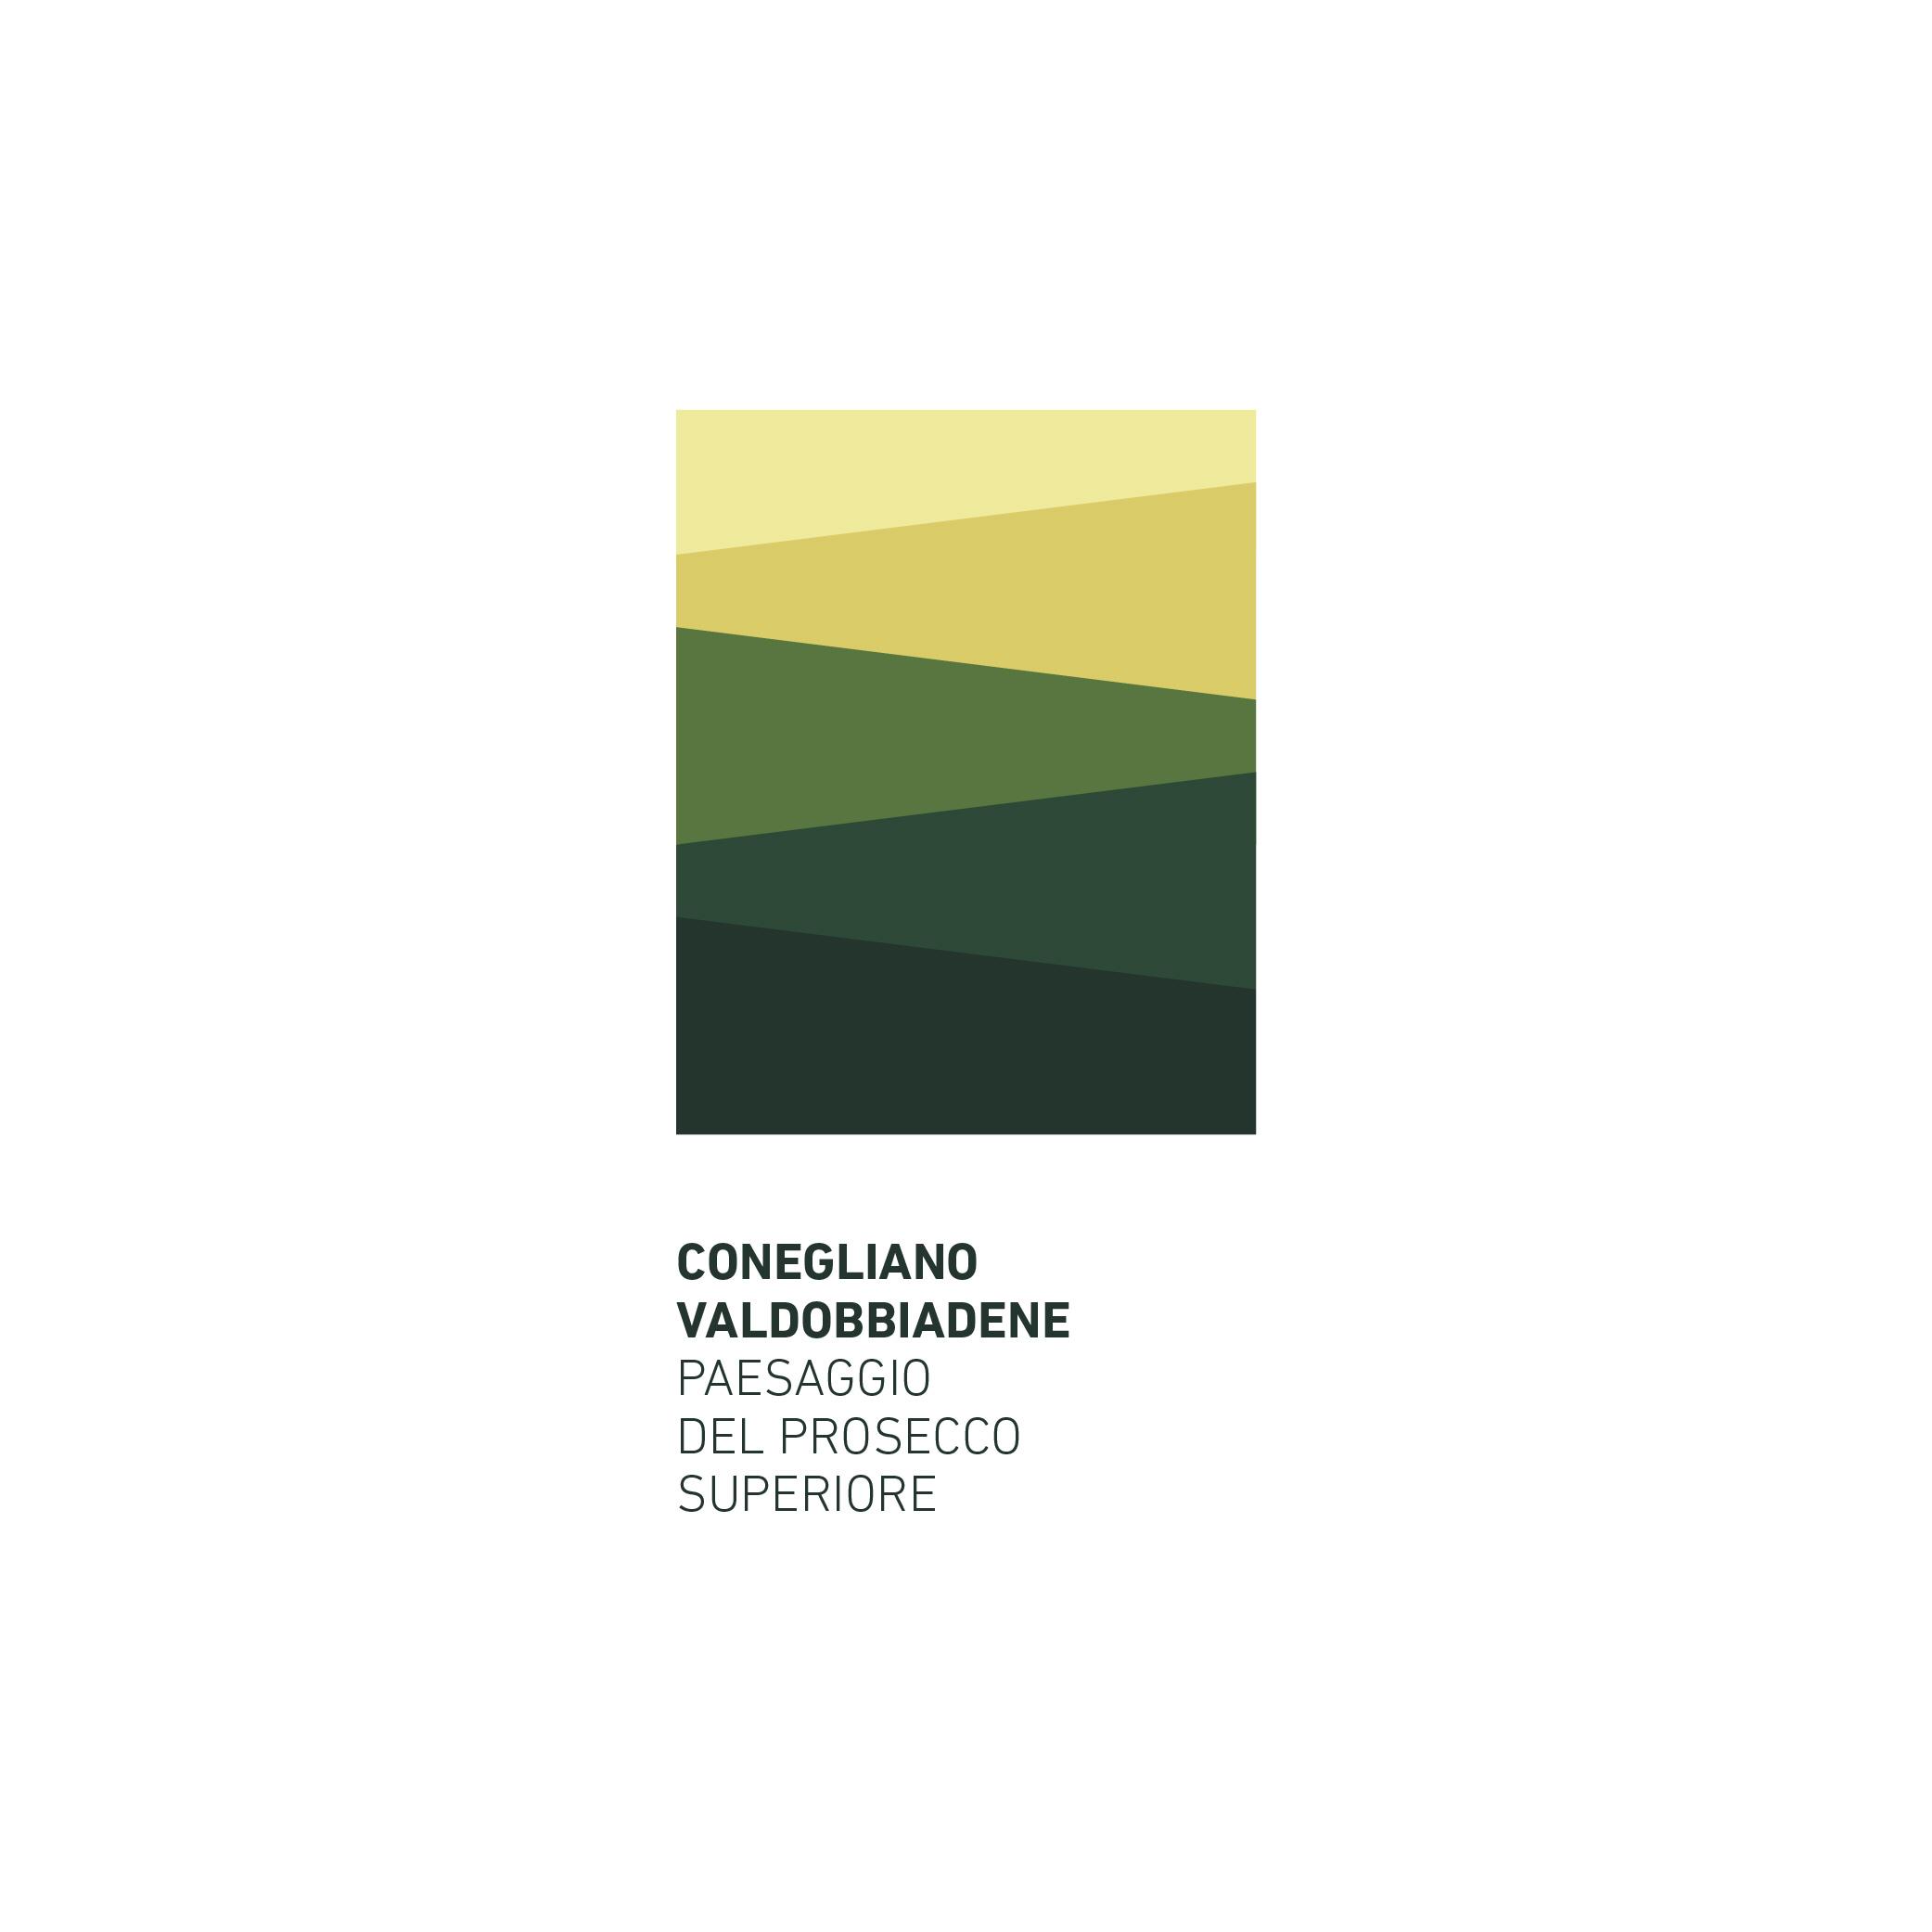 Conegliano Valdobbiadene Logo